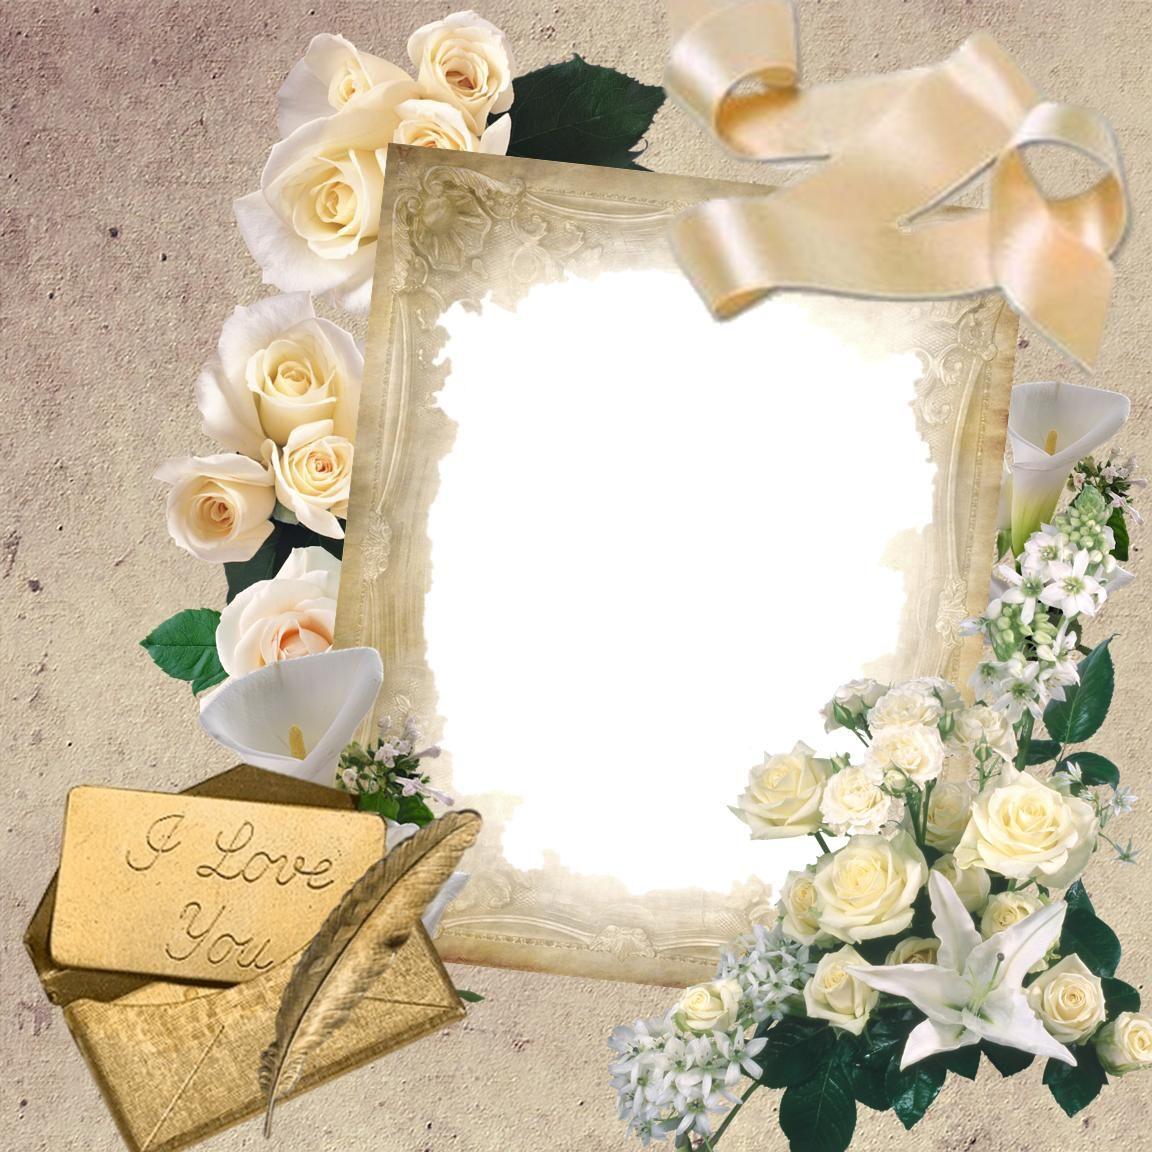 Vintage wedding scrapbook ideas - Wedding Scrapbook Layouts Vintage Wedding Qp Digital Scrapbooking At Scrapbook Flair